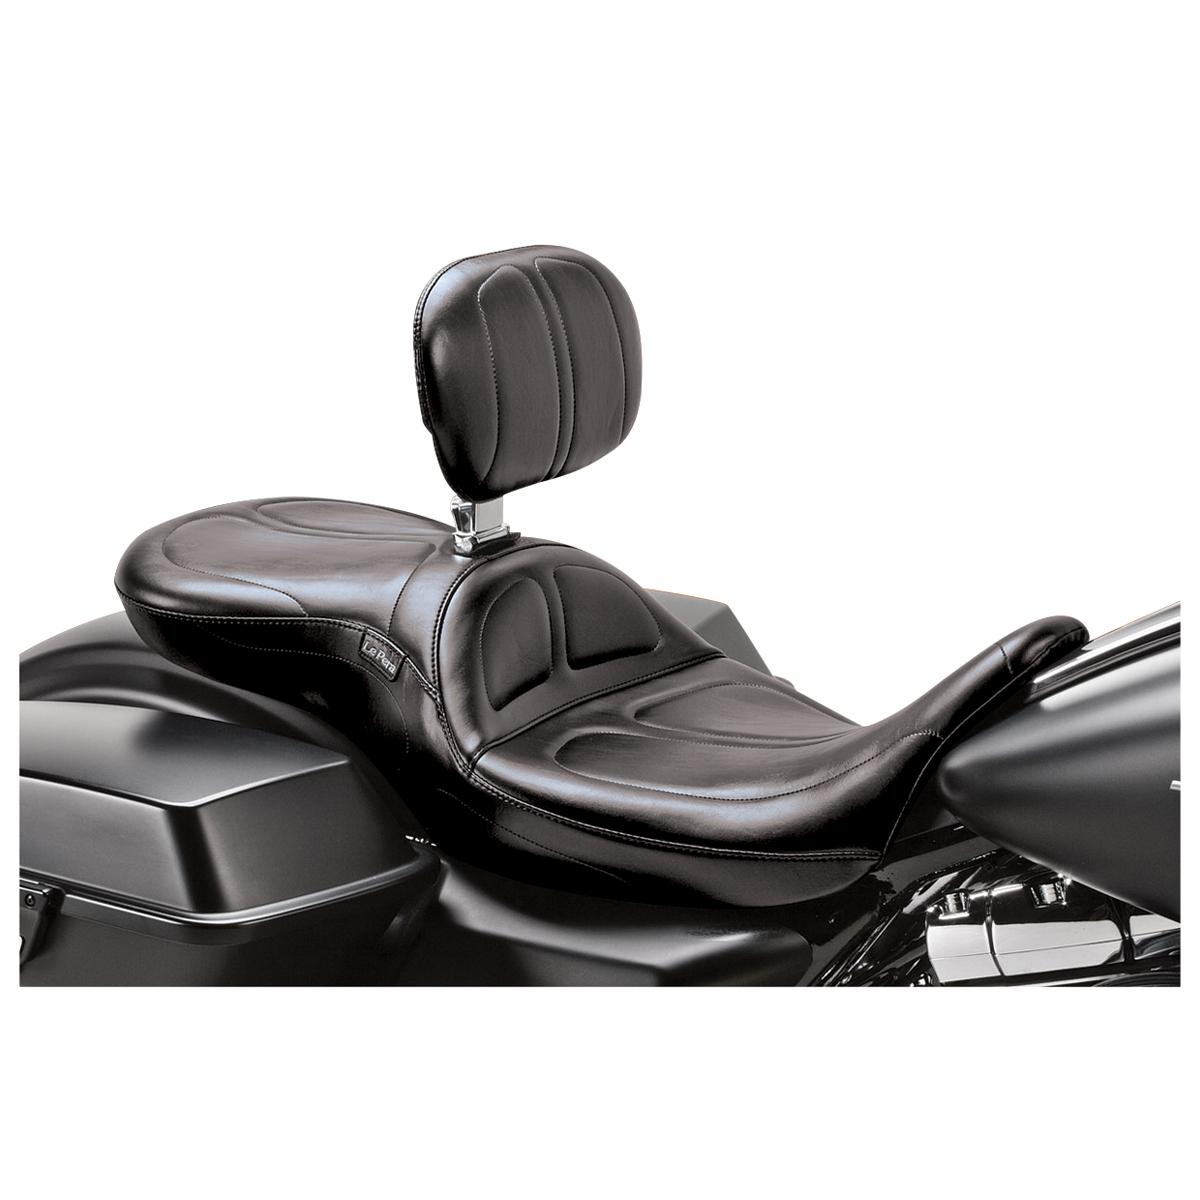 Le Pera Maverick Stitch 2-Up Seat with Driver Backrest